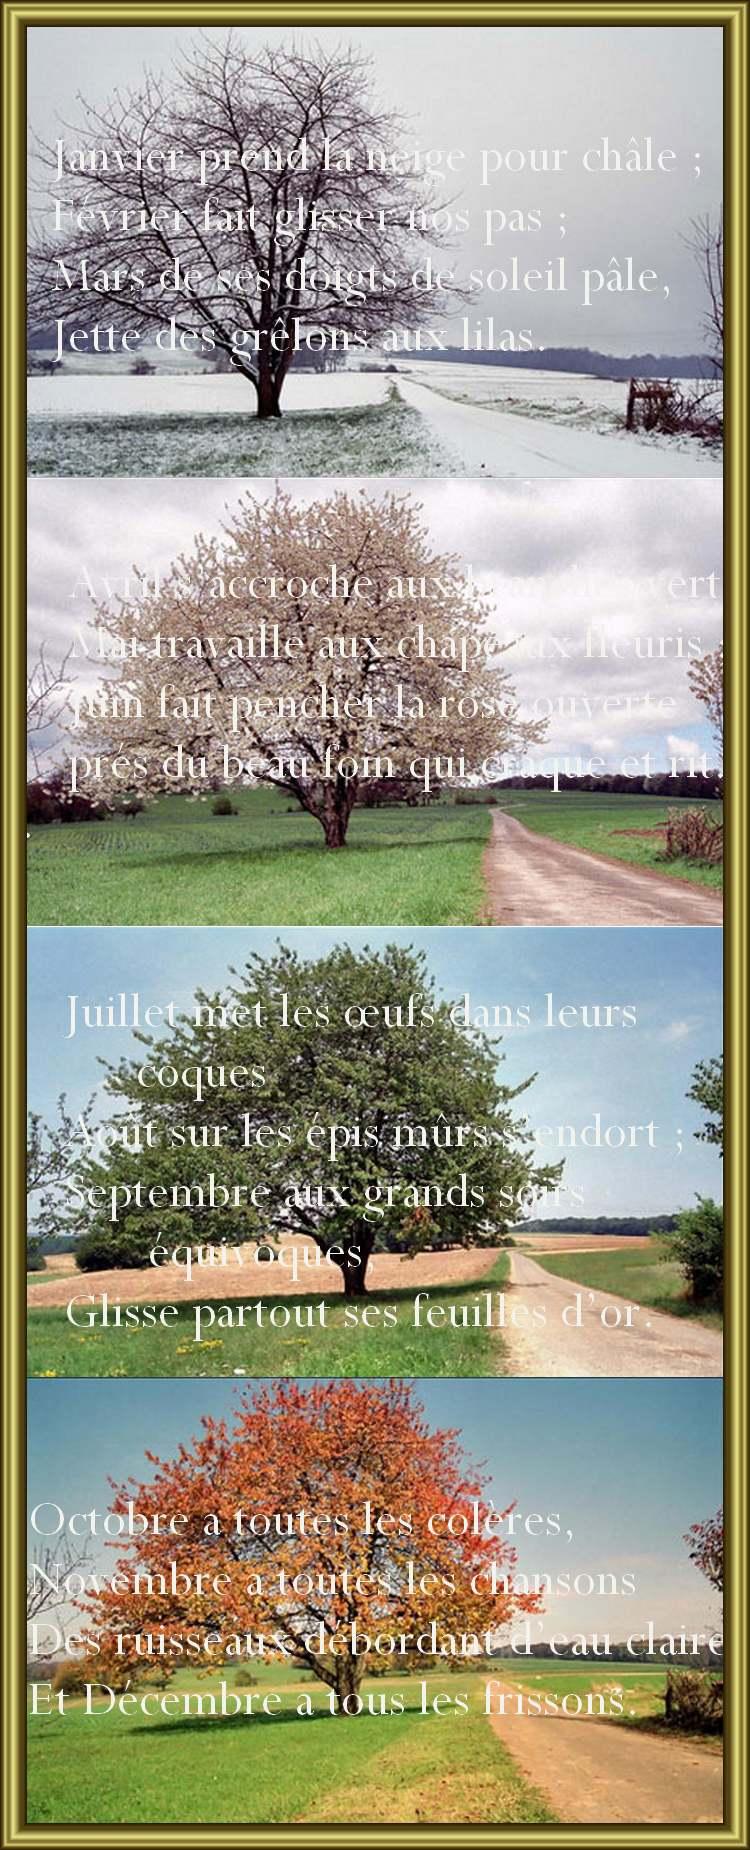 Poésie La Ronde Des Mois : poésie, ronde, Ronde, Mois